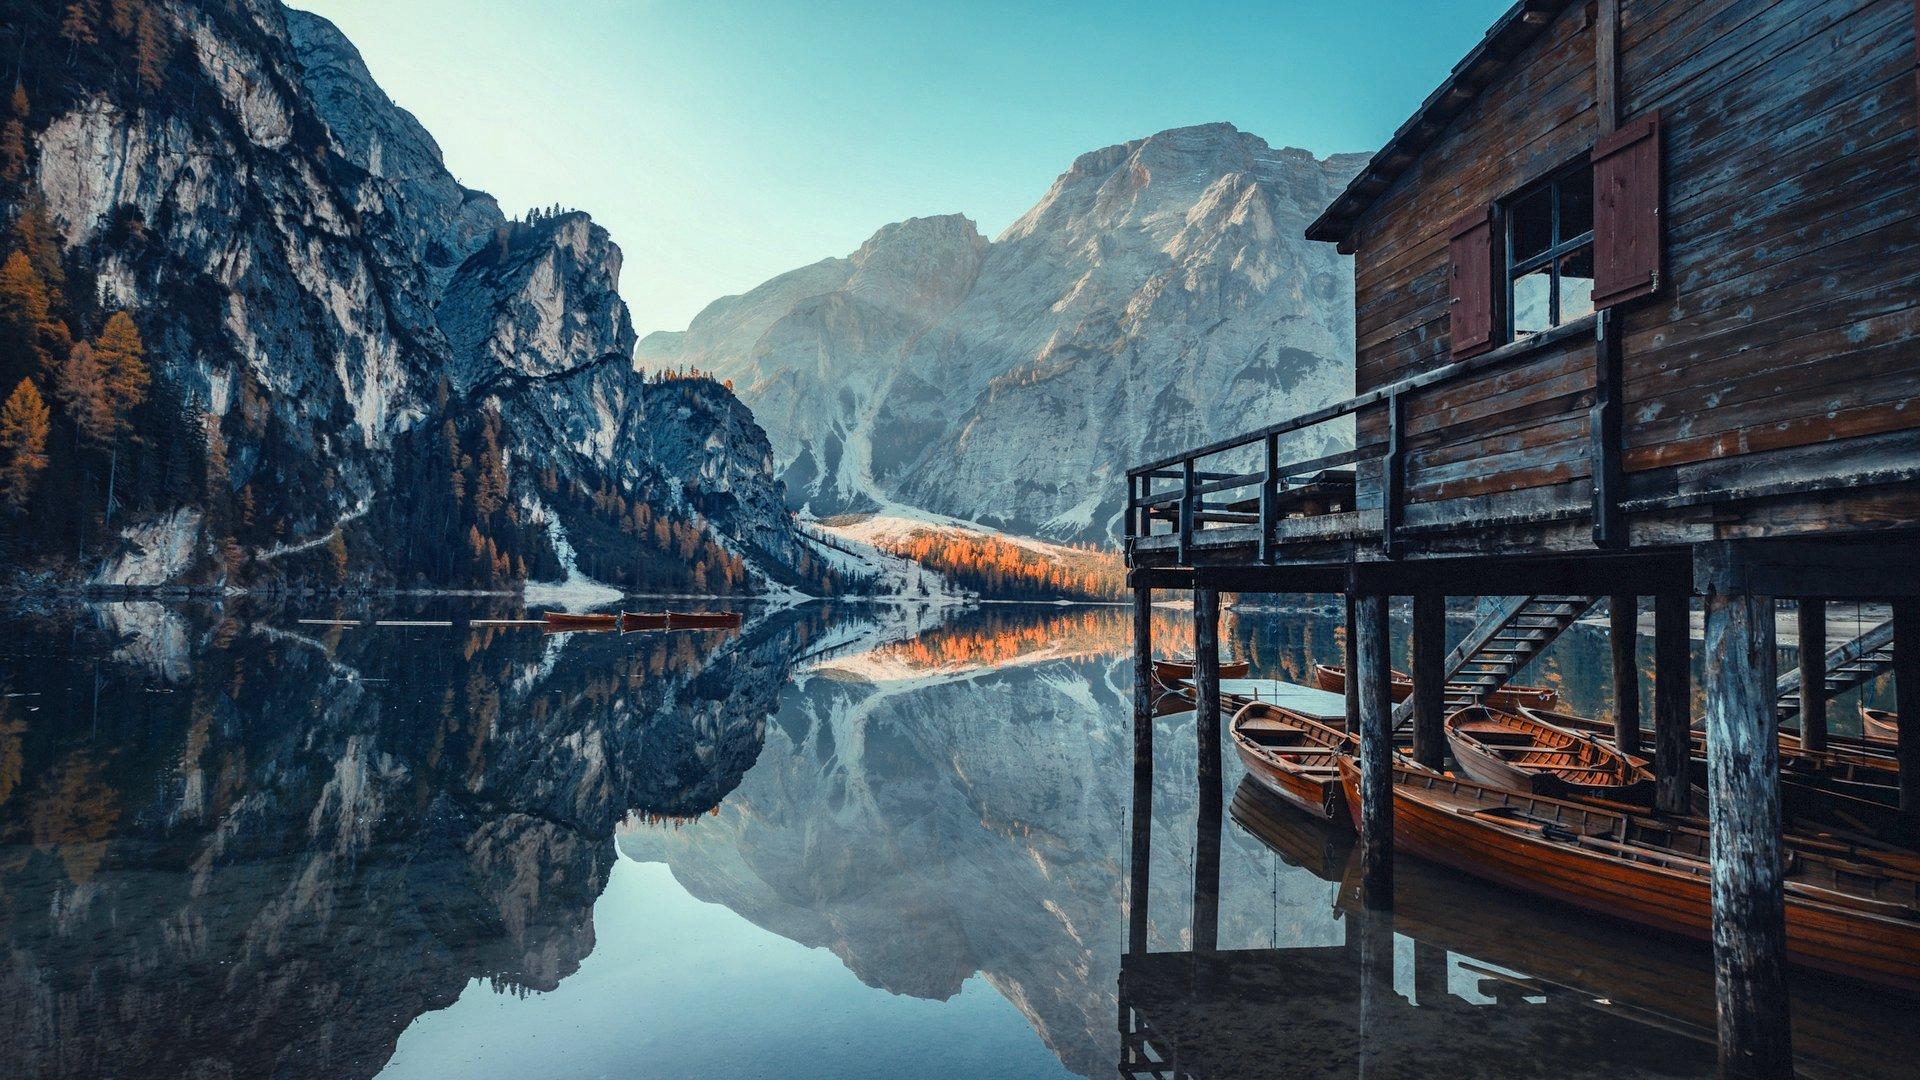 La Palafitta Lago Di Braies Noleggio Barche Shooting